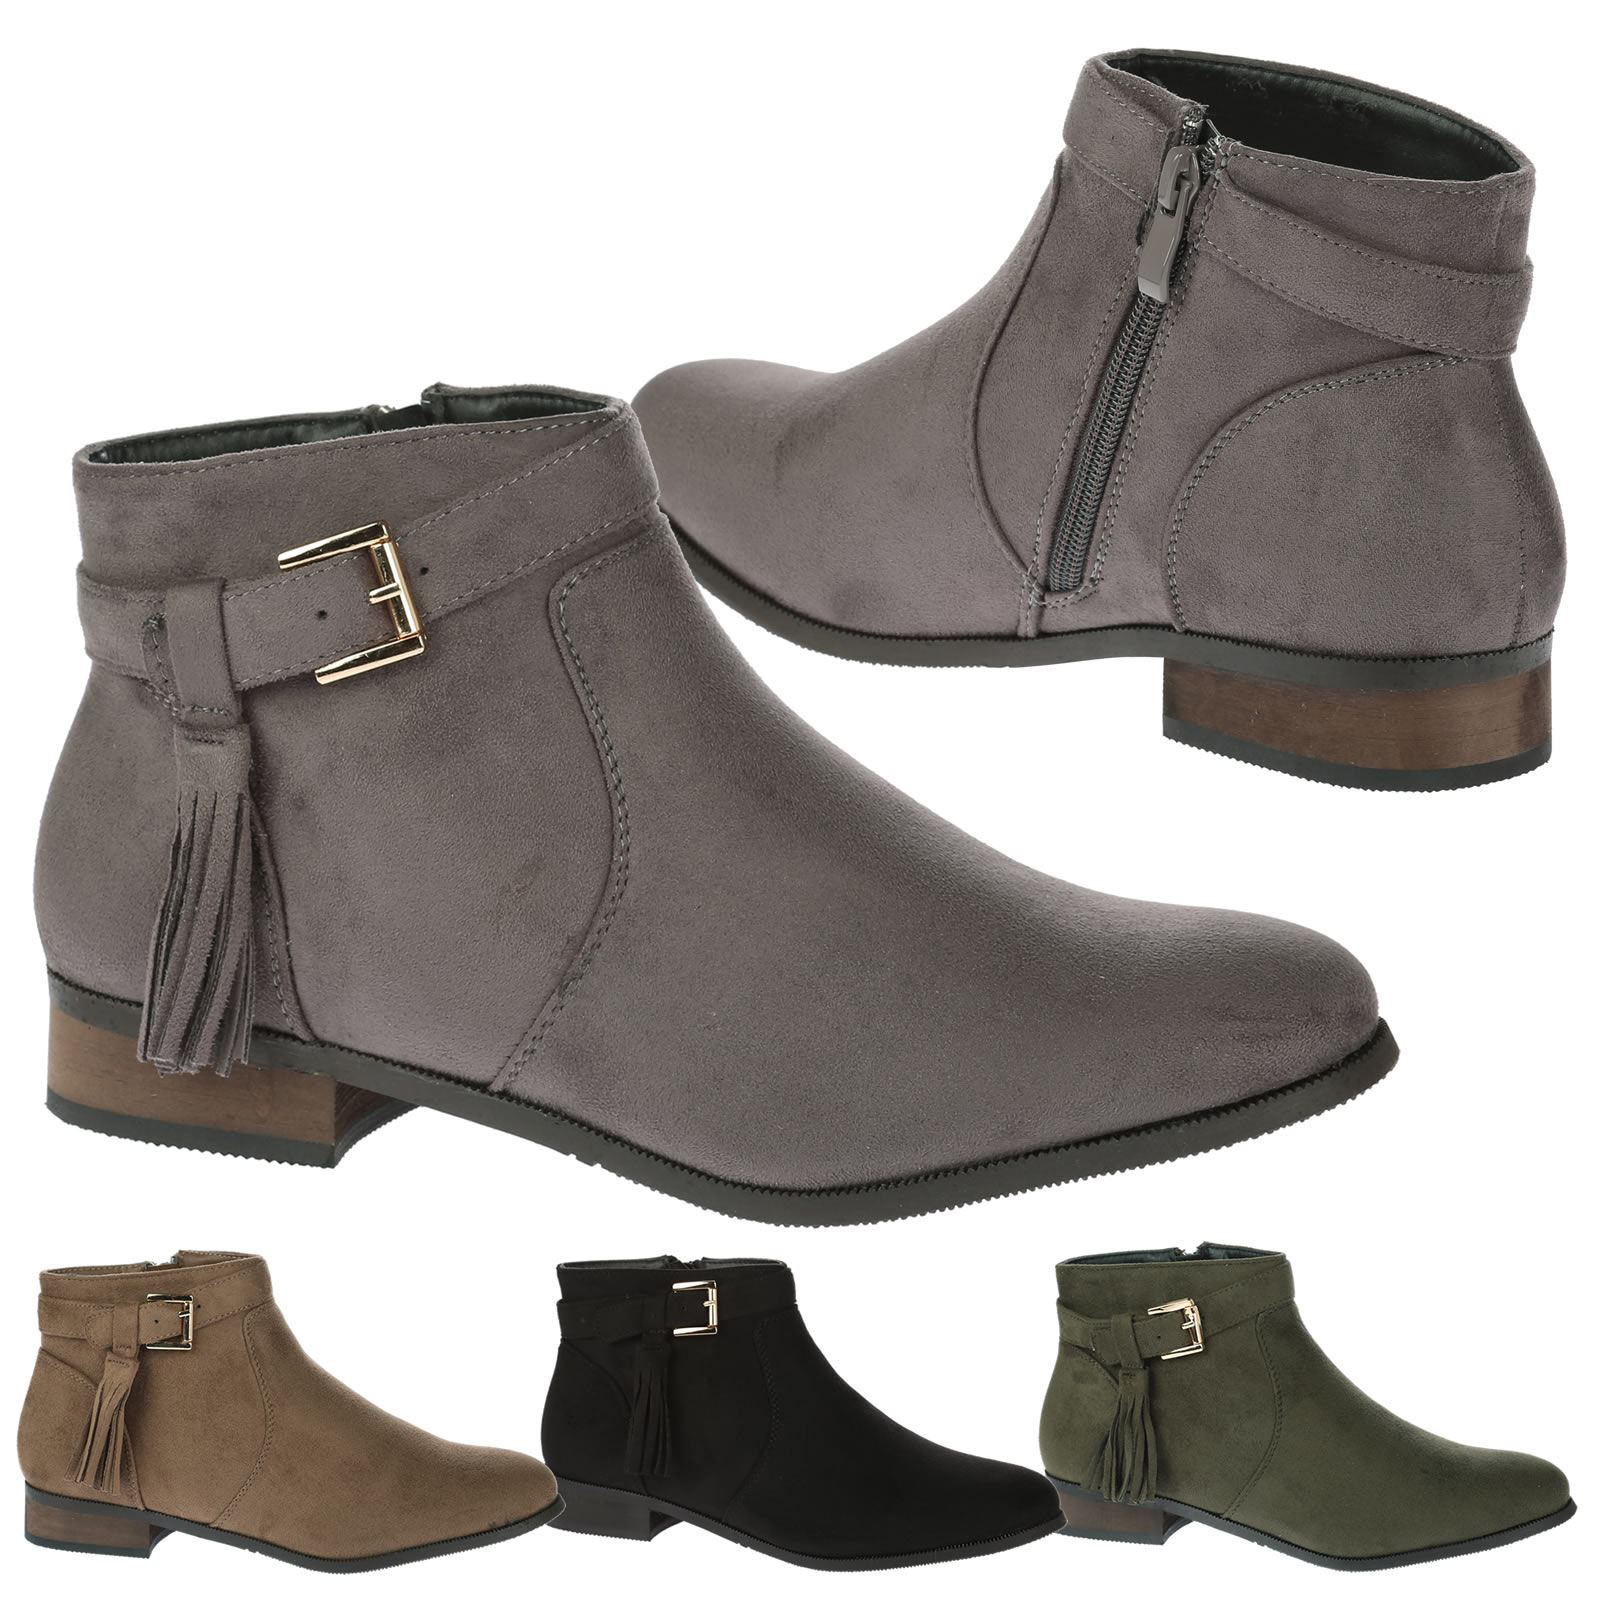 Waterproof Shoes Womens Yard Work Amazon